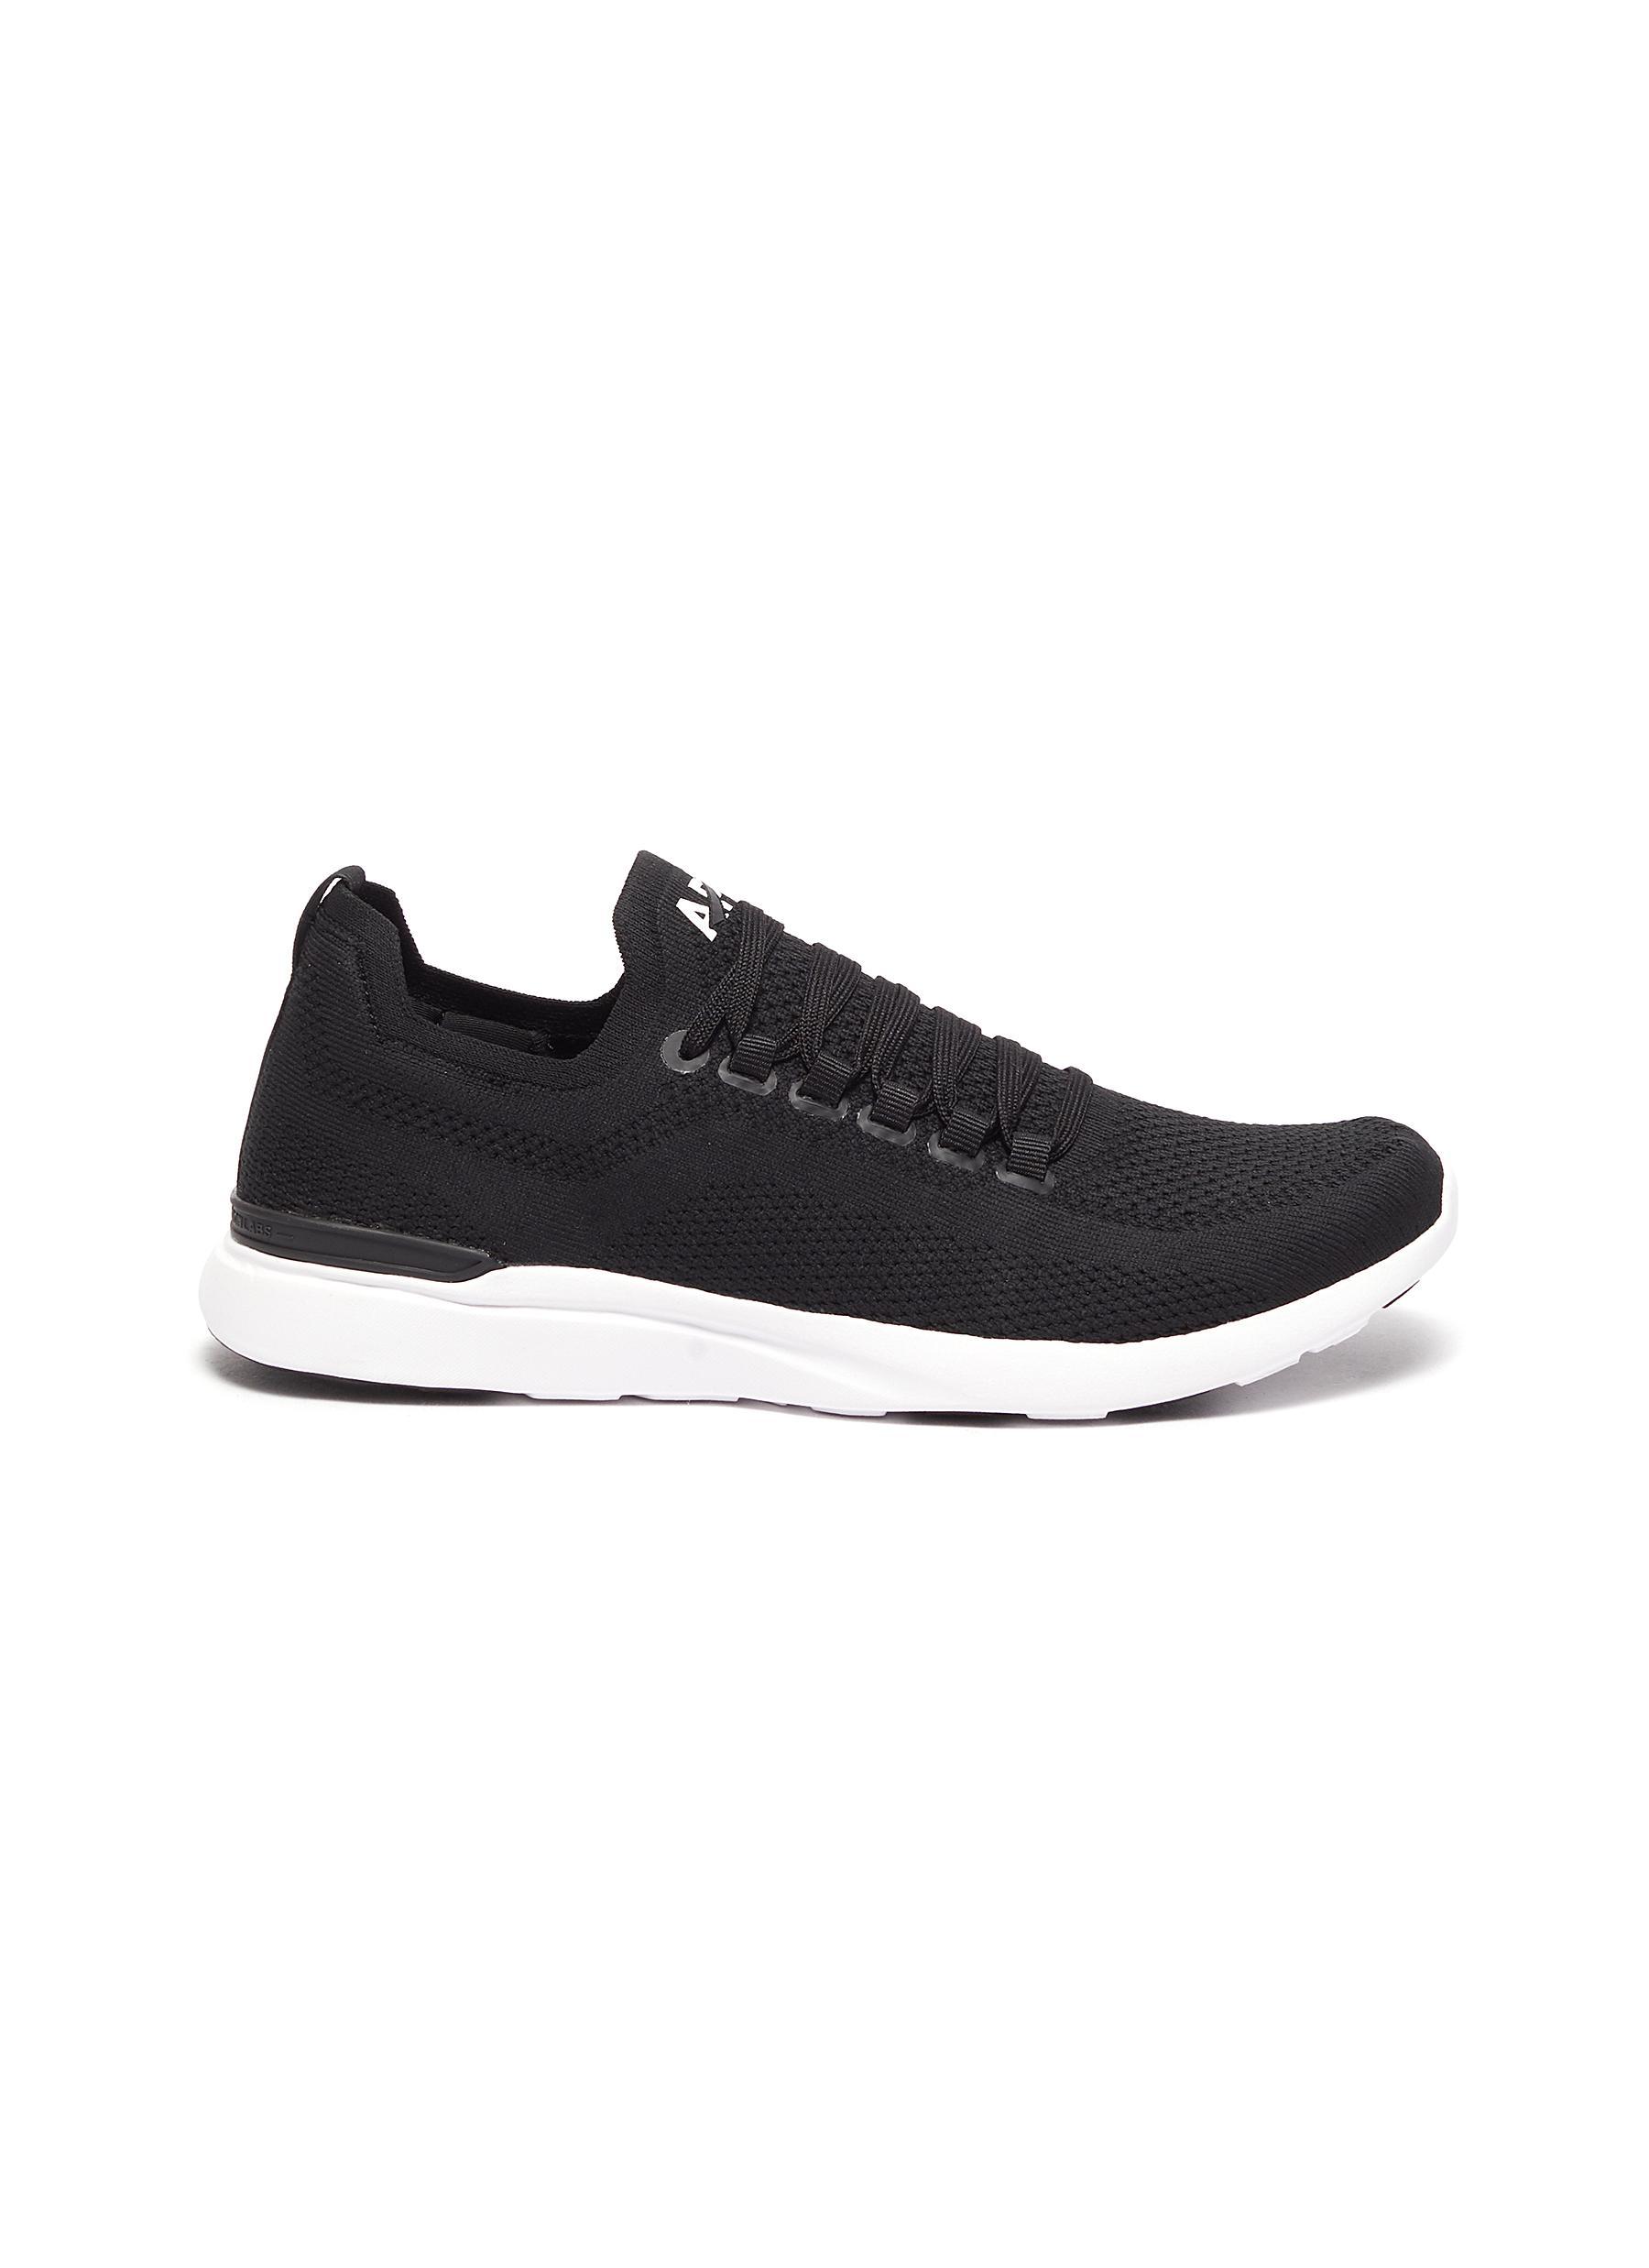 'TechLoom Breeze' Lace Up Sneakers